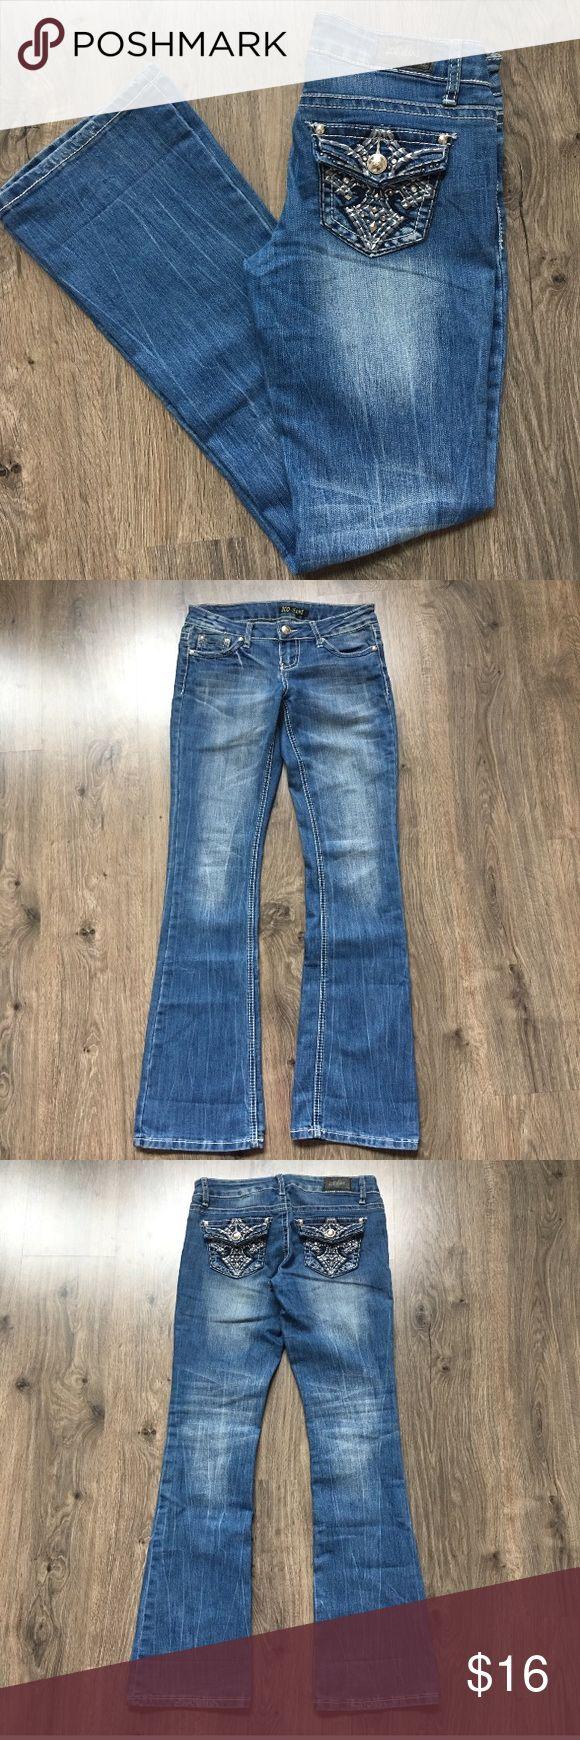 Zco Jeans Boot cut Zco jeans. ZCO Jeans Boot Cut